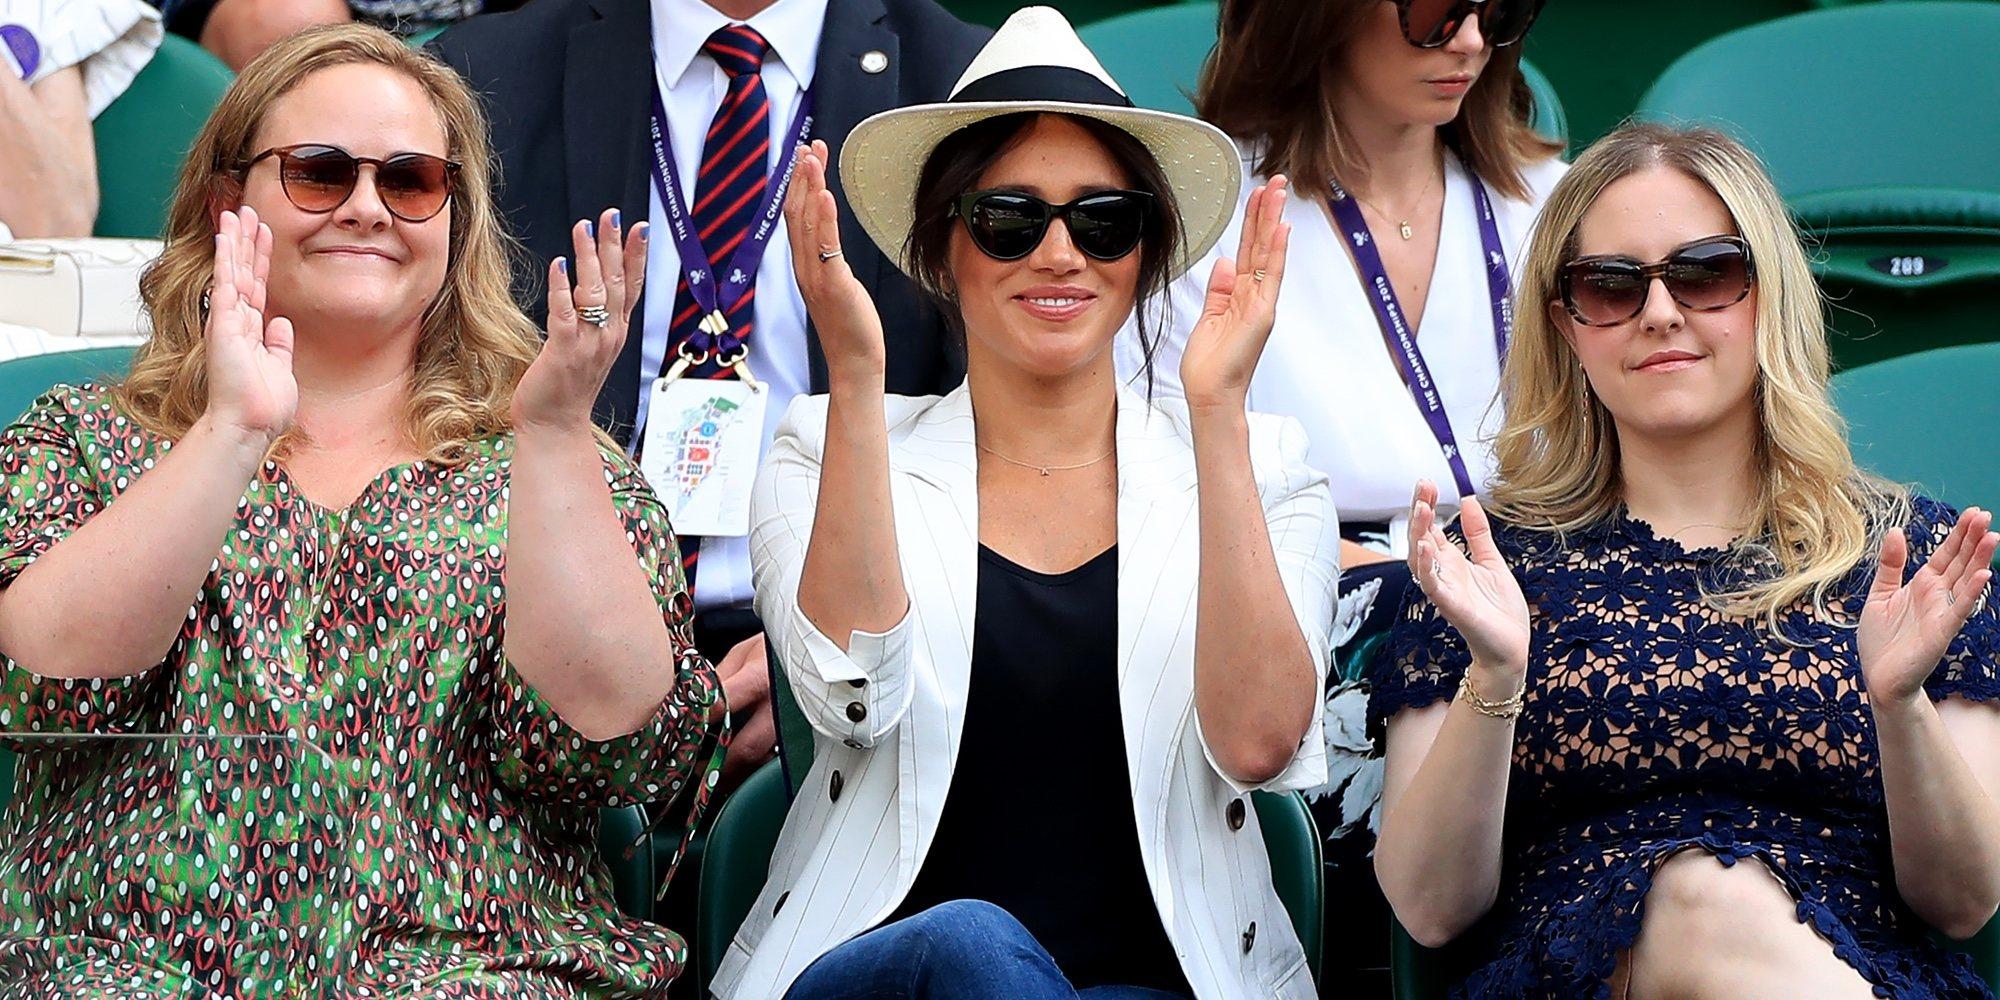 Meghan Markle reaparece en Wimbledon 2019 para ver jugar a su gran amiga Serena Williams